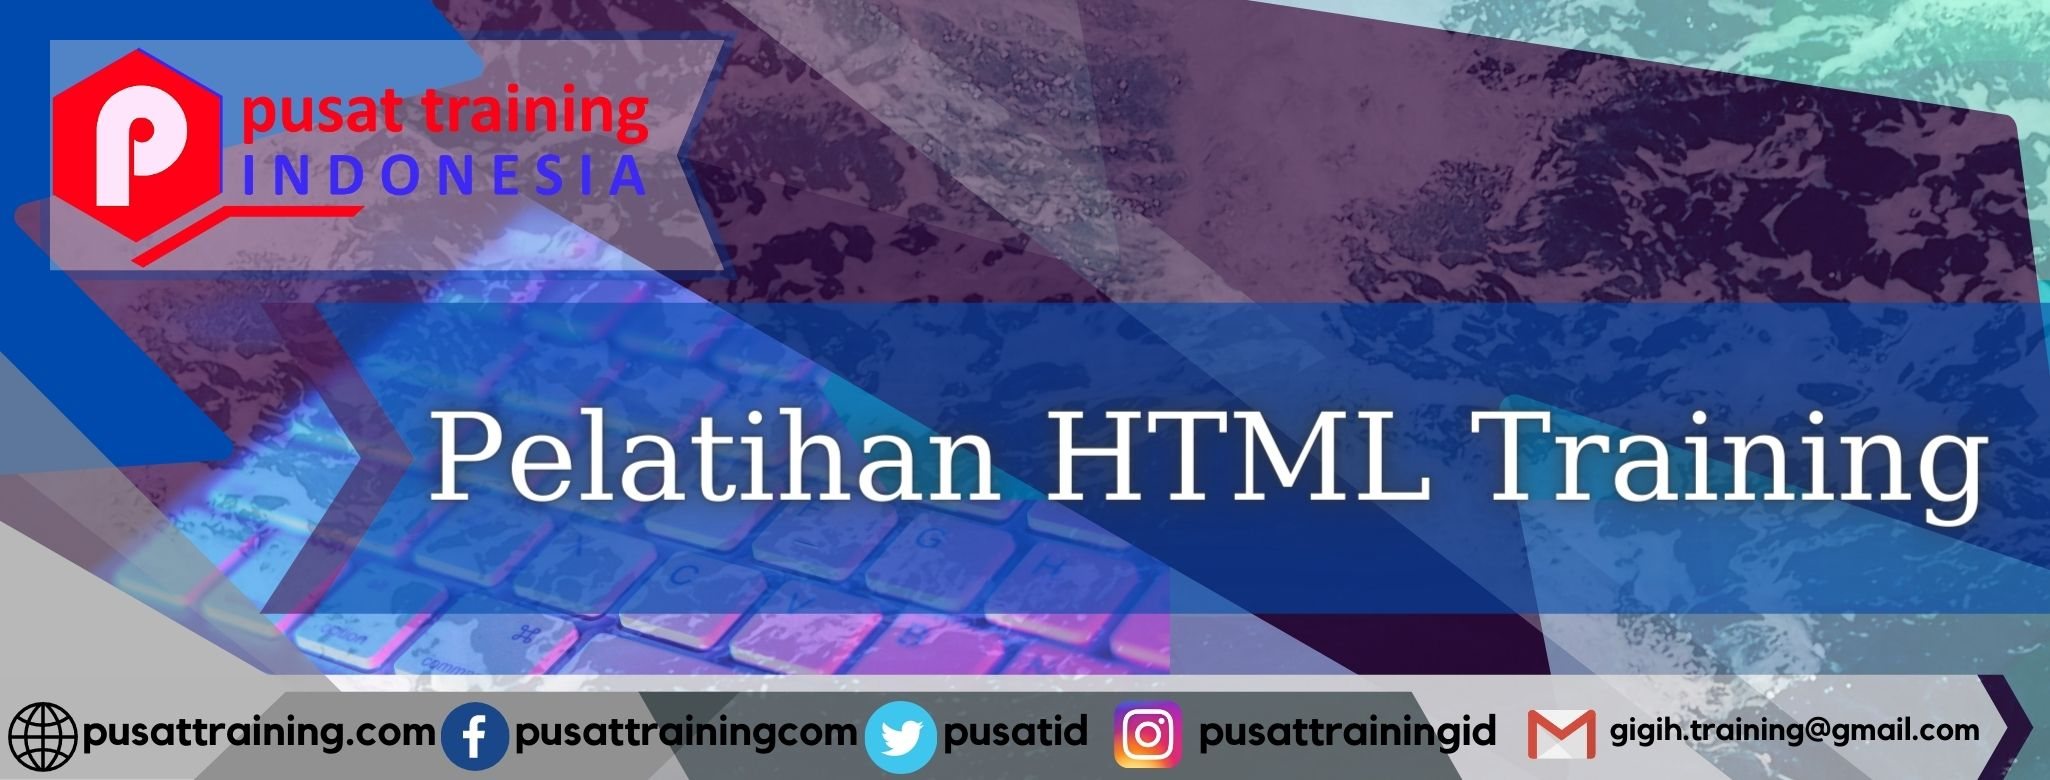 Pelatihan-HTML-Training.